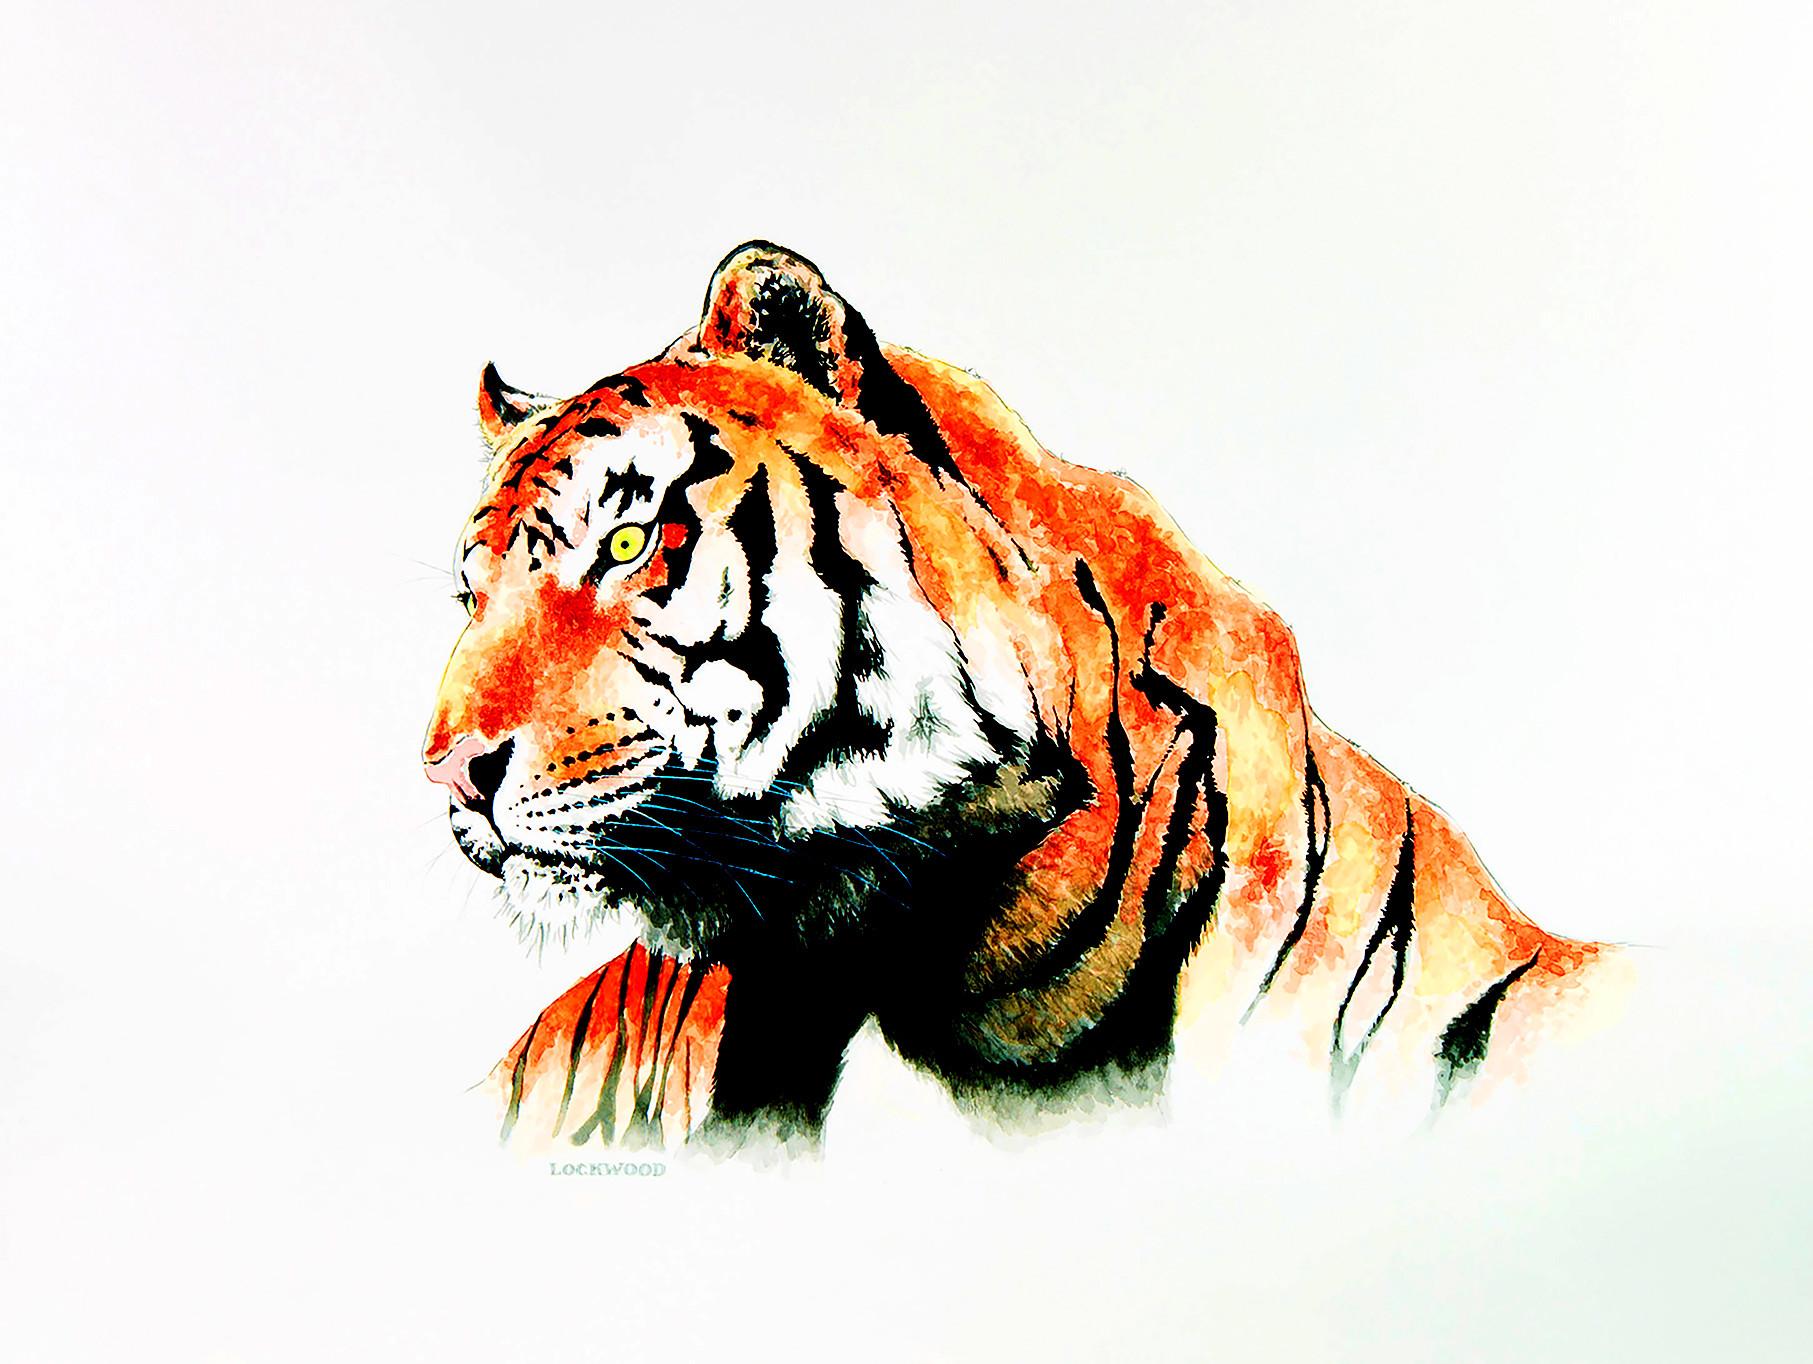 Jason lockwood personal tiger2